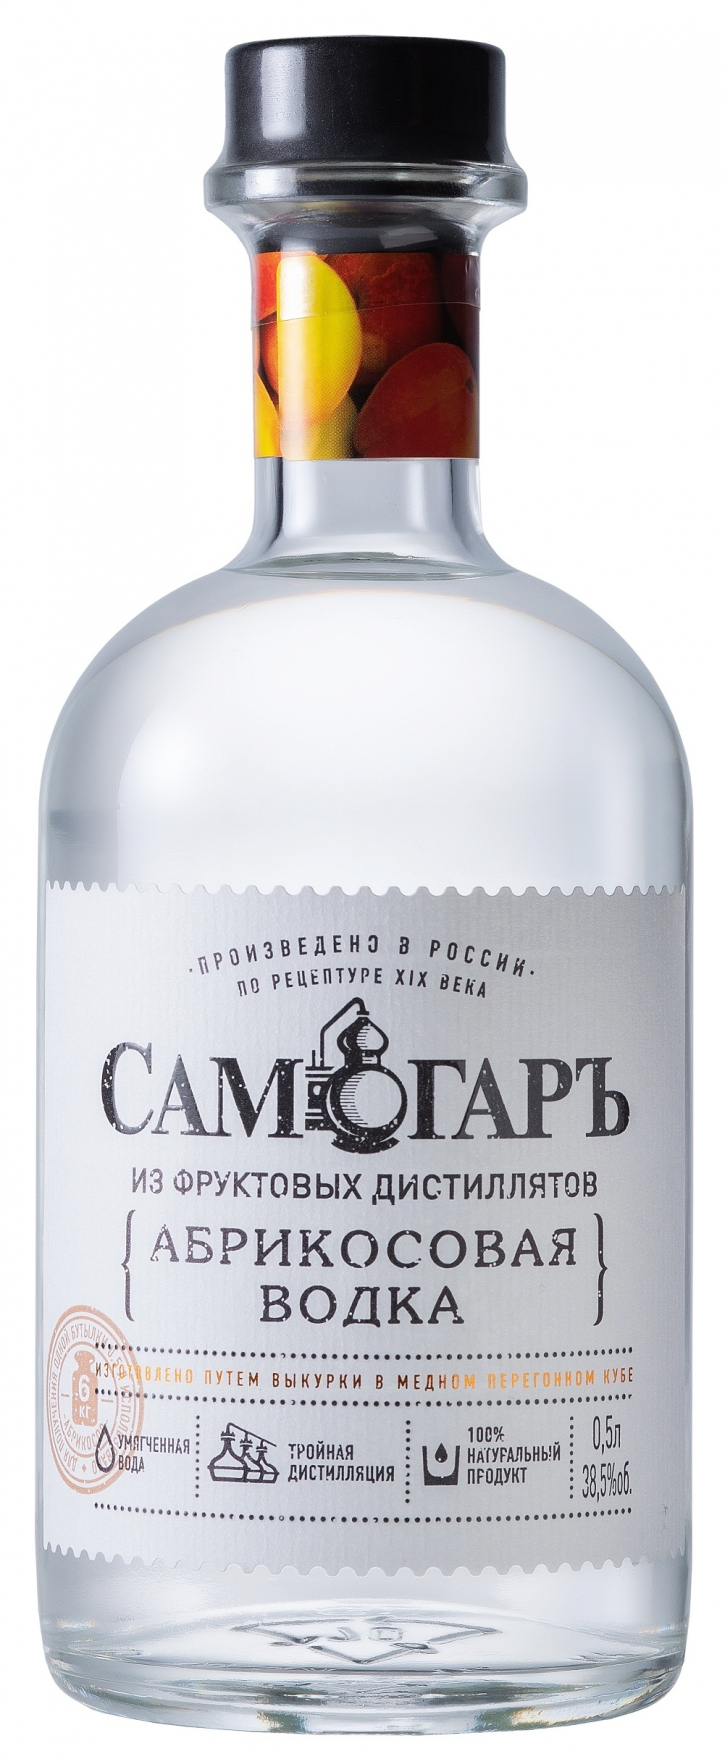 Абрикосовая водка «Самогаръ»